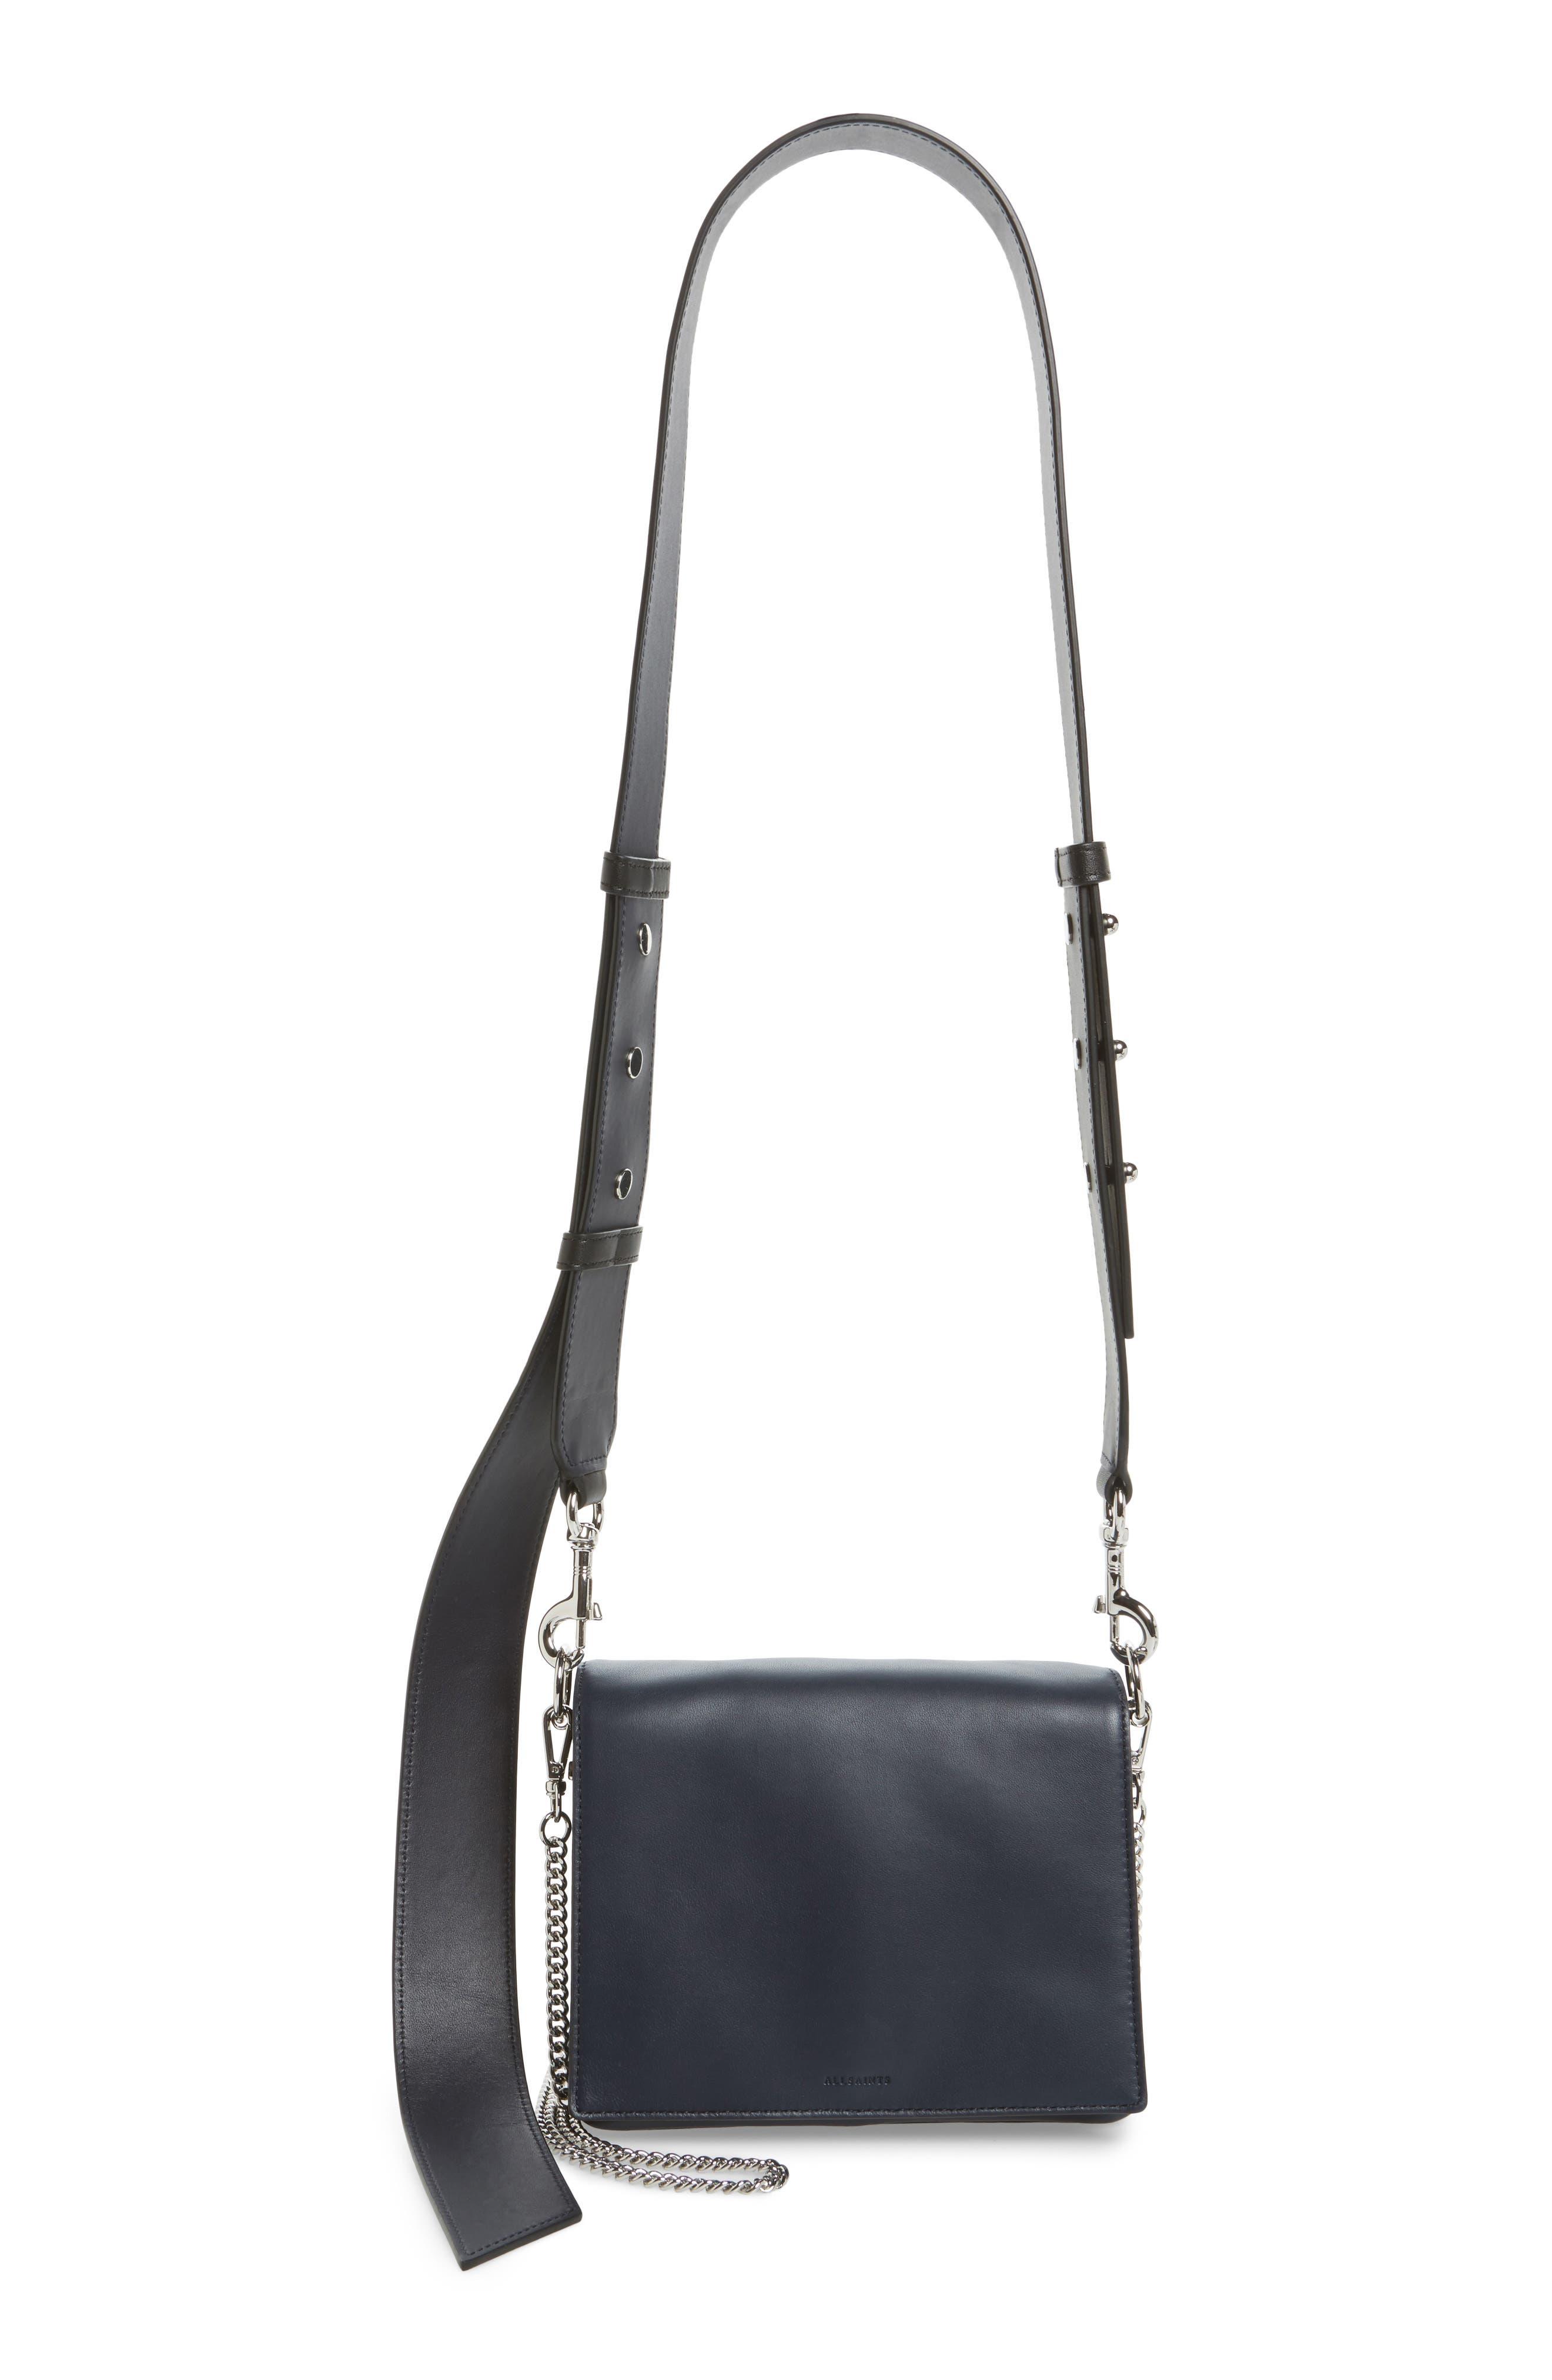 Zep Lambskin Leather Shoulder Bag,                             Main thumbnail 1, color,